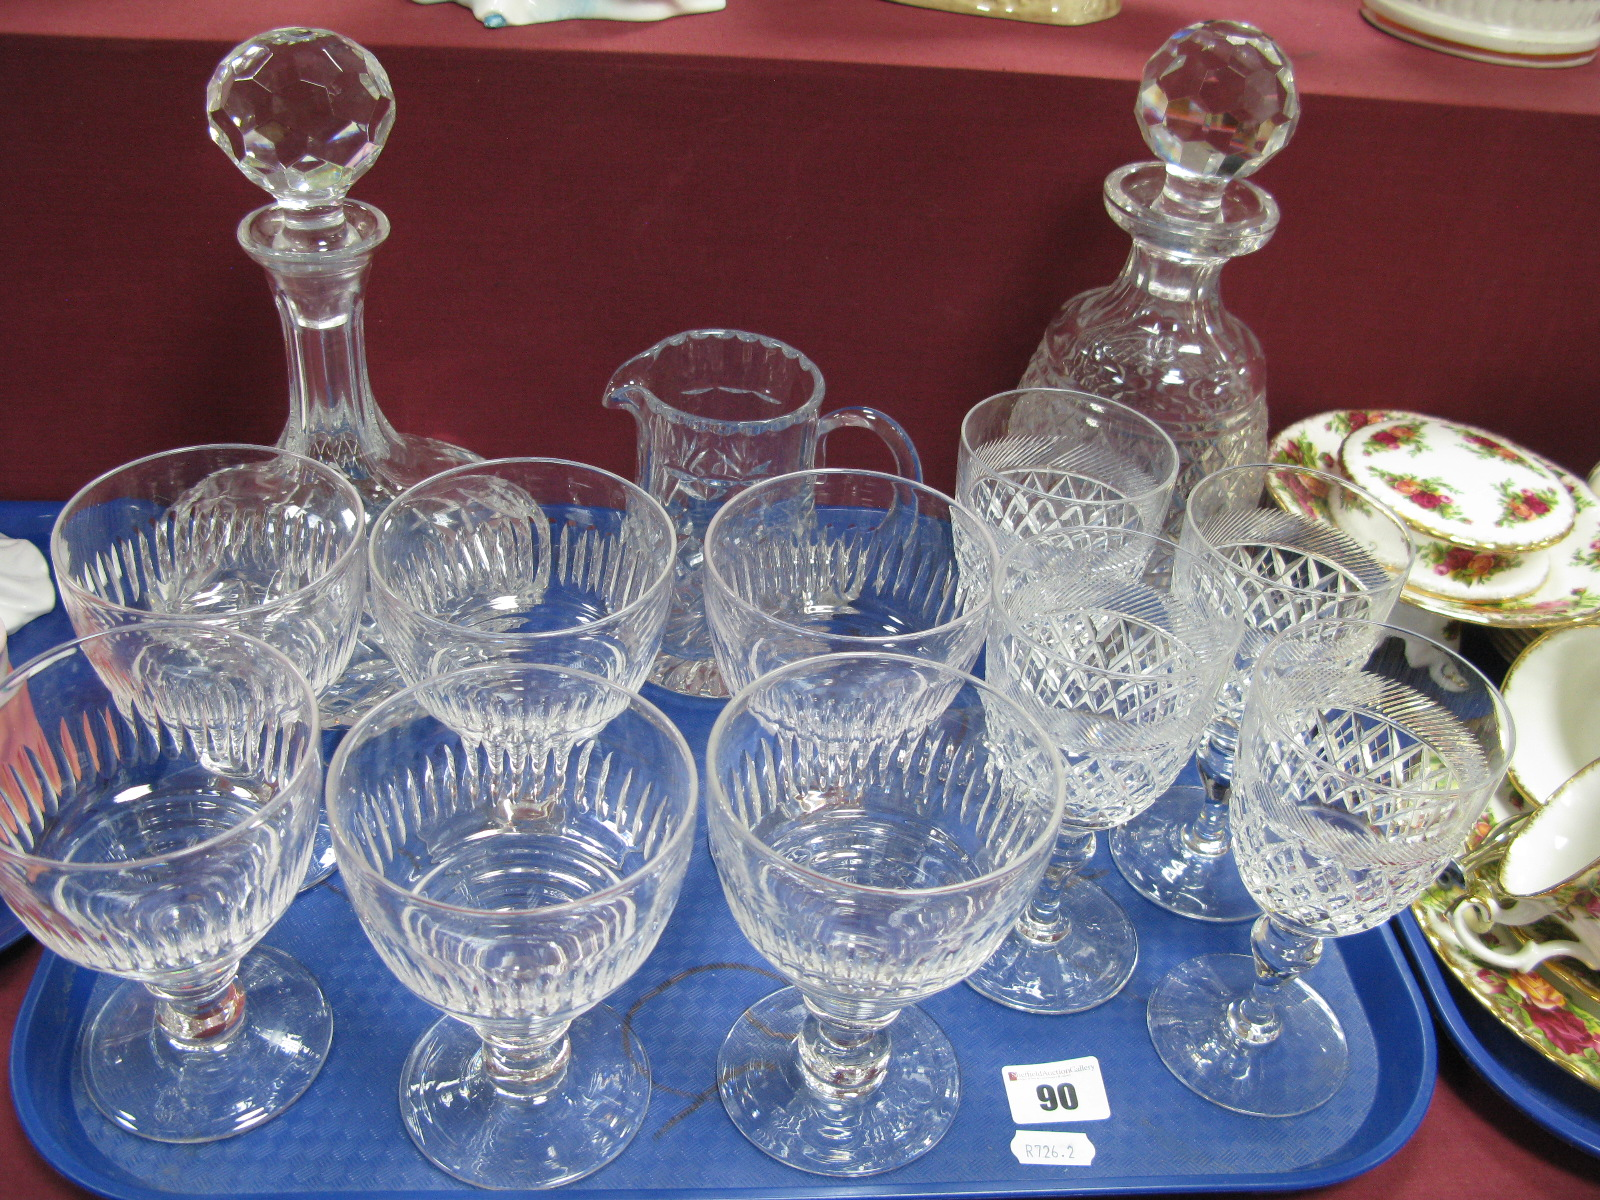 Lot 90 - A Set of Six Stuart Wine Glasses, decanters, four Webb wine glasses:- One Tray